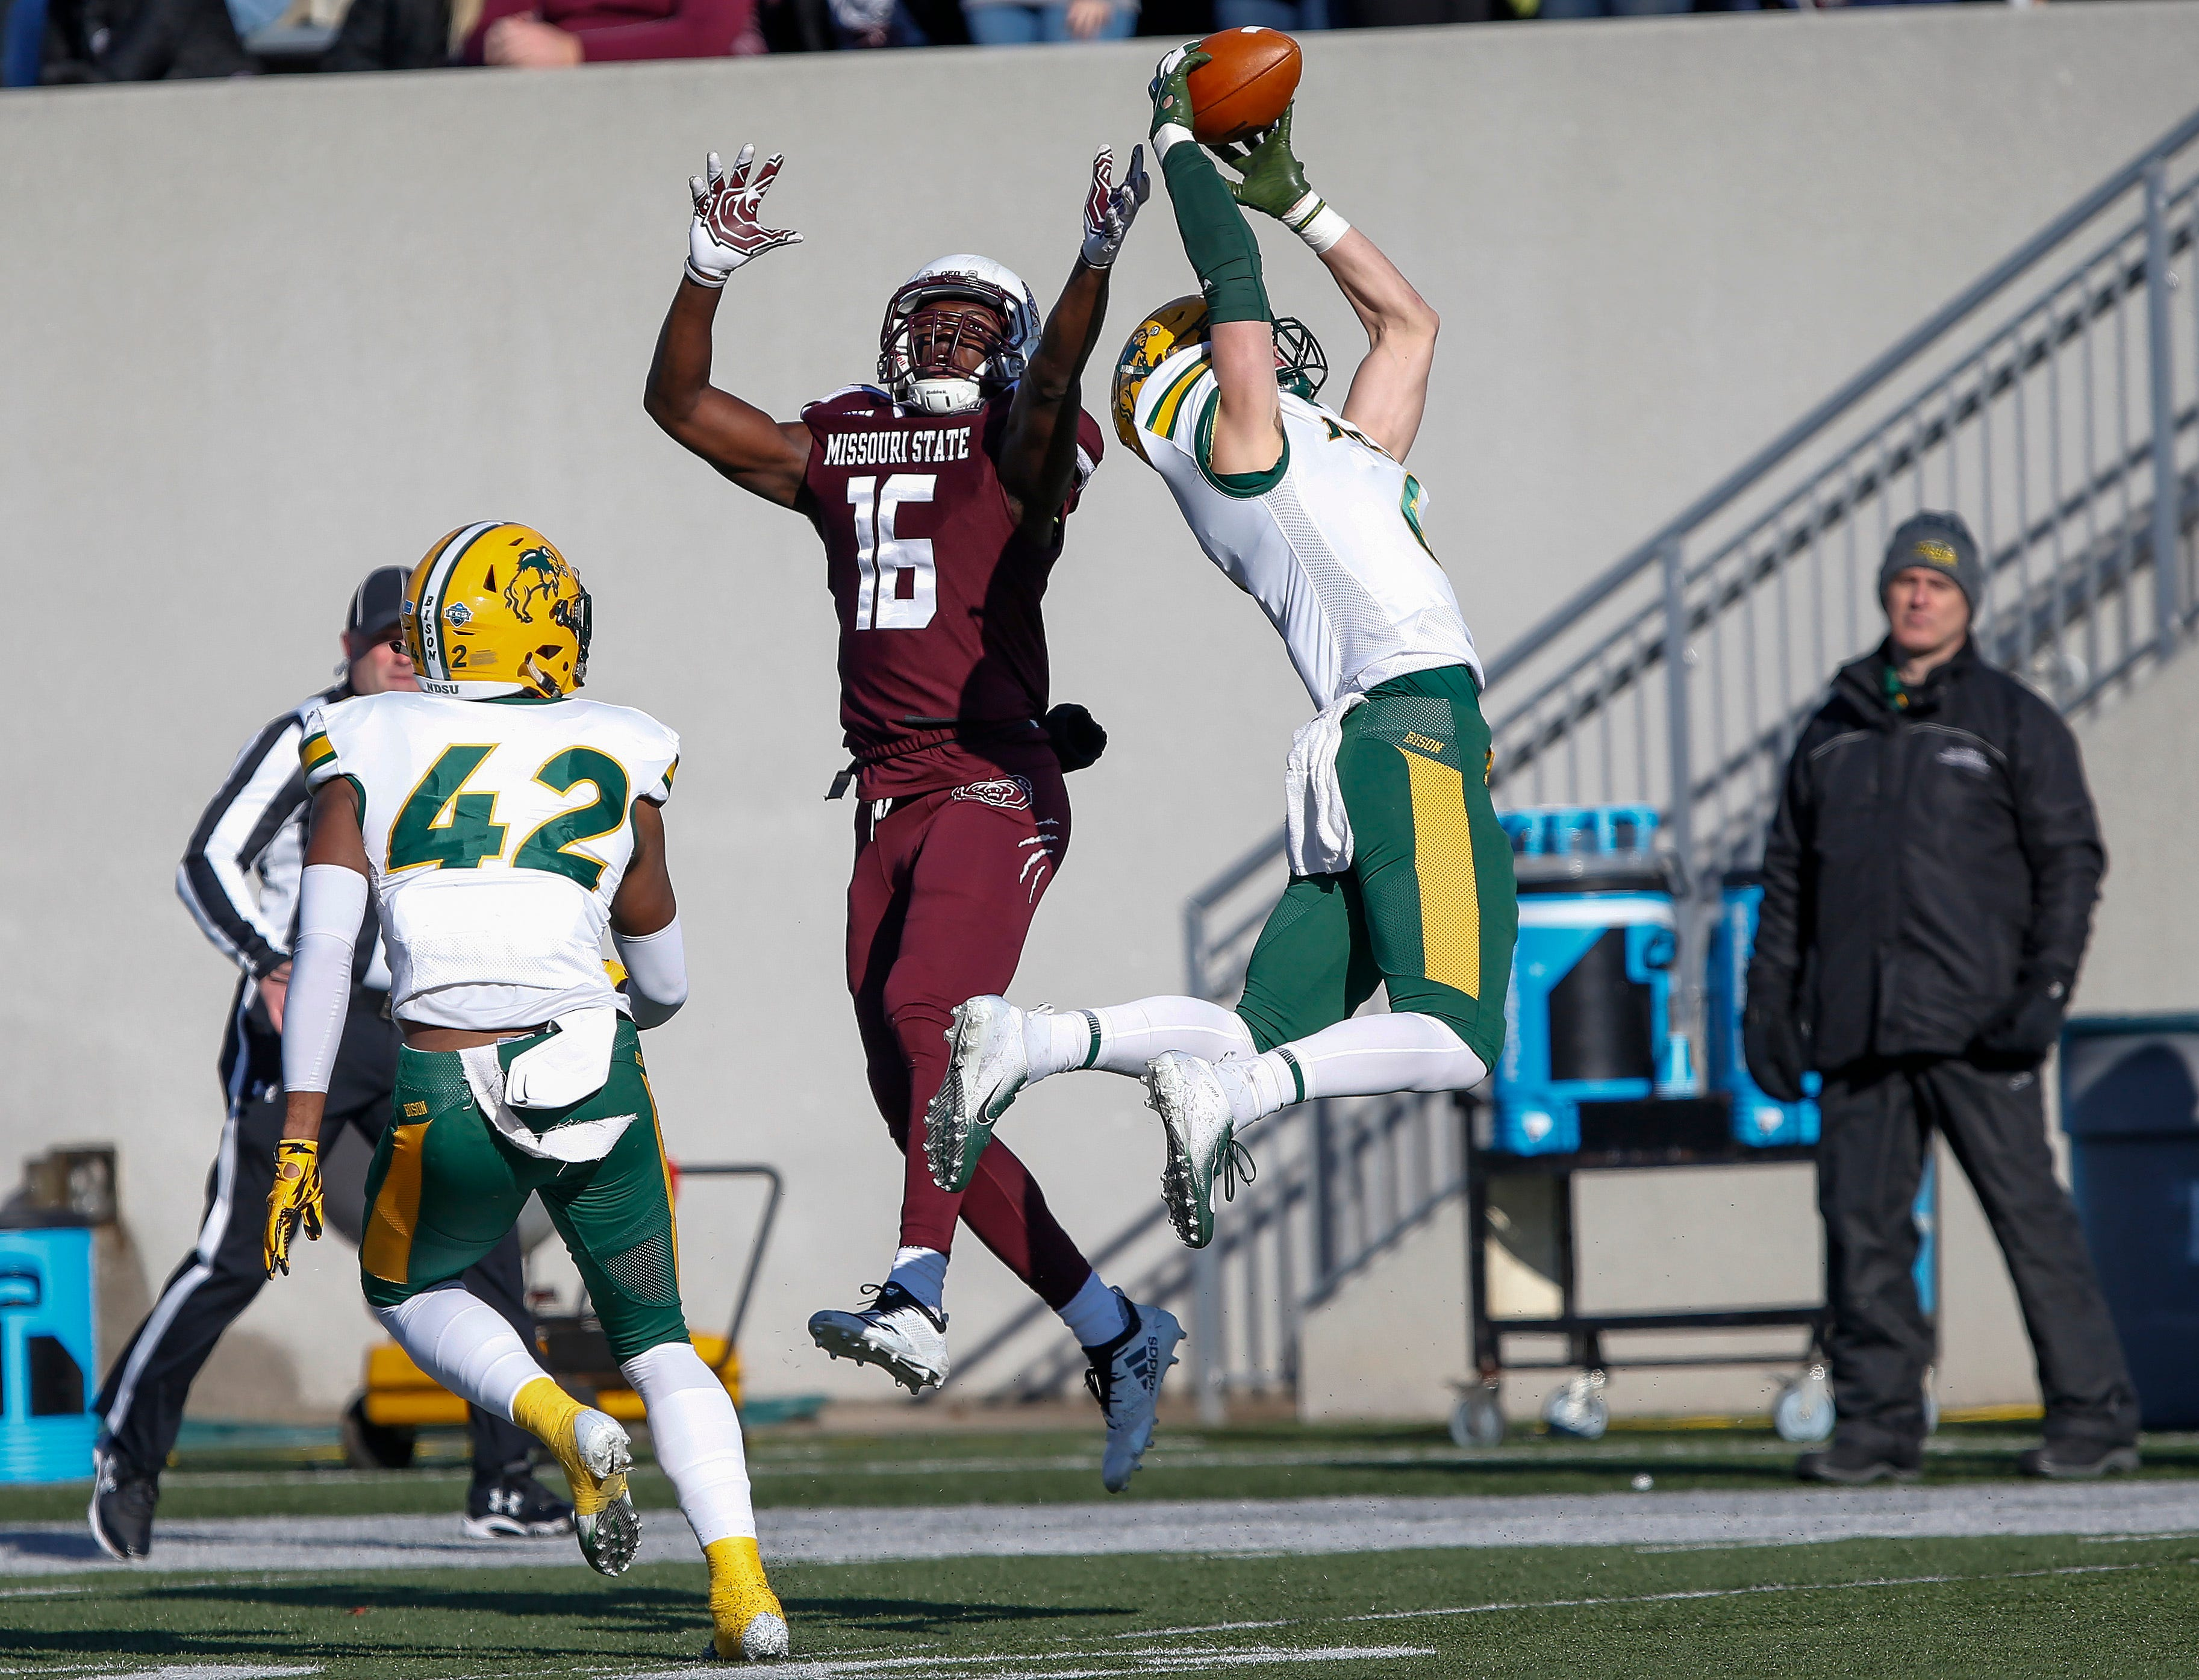 North Dakota State's James Hendricks intercepts a pass intended for Damoriea Vick during the Bison's game against Missouri State University at Plaster Stadium on Saturday, Nov. 10, 2018.